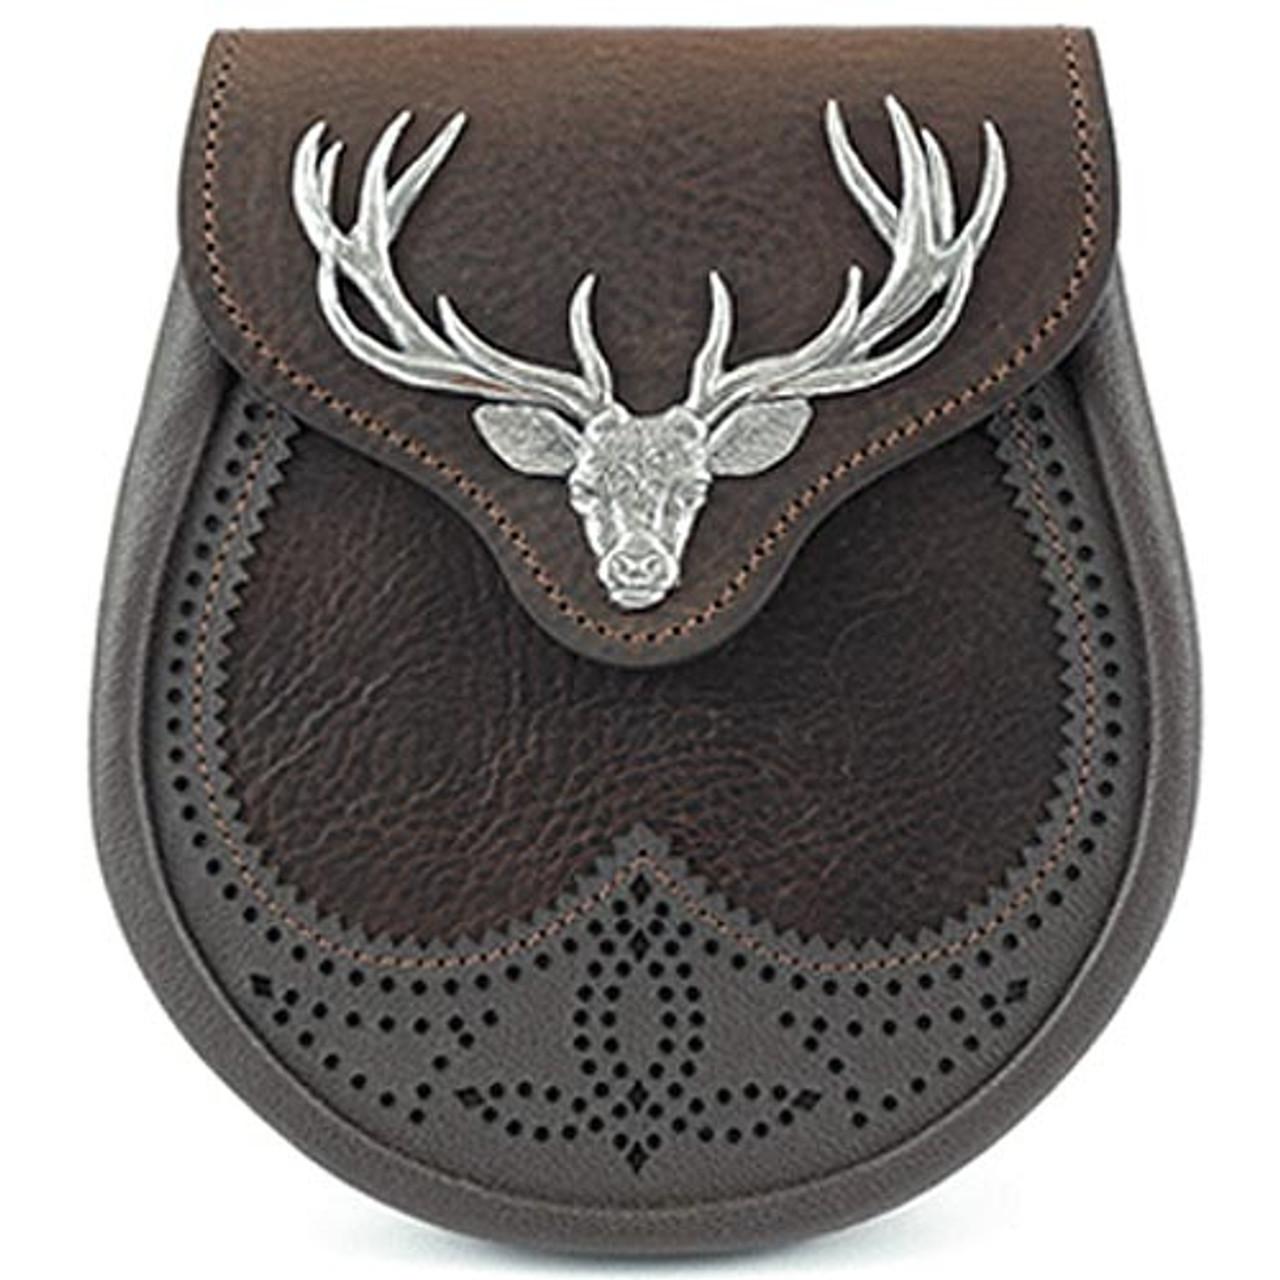 Half Dress Kilt Sporran Black Leather with Stag Head Badge//Leather Sporran Black